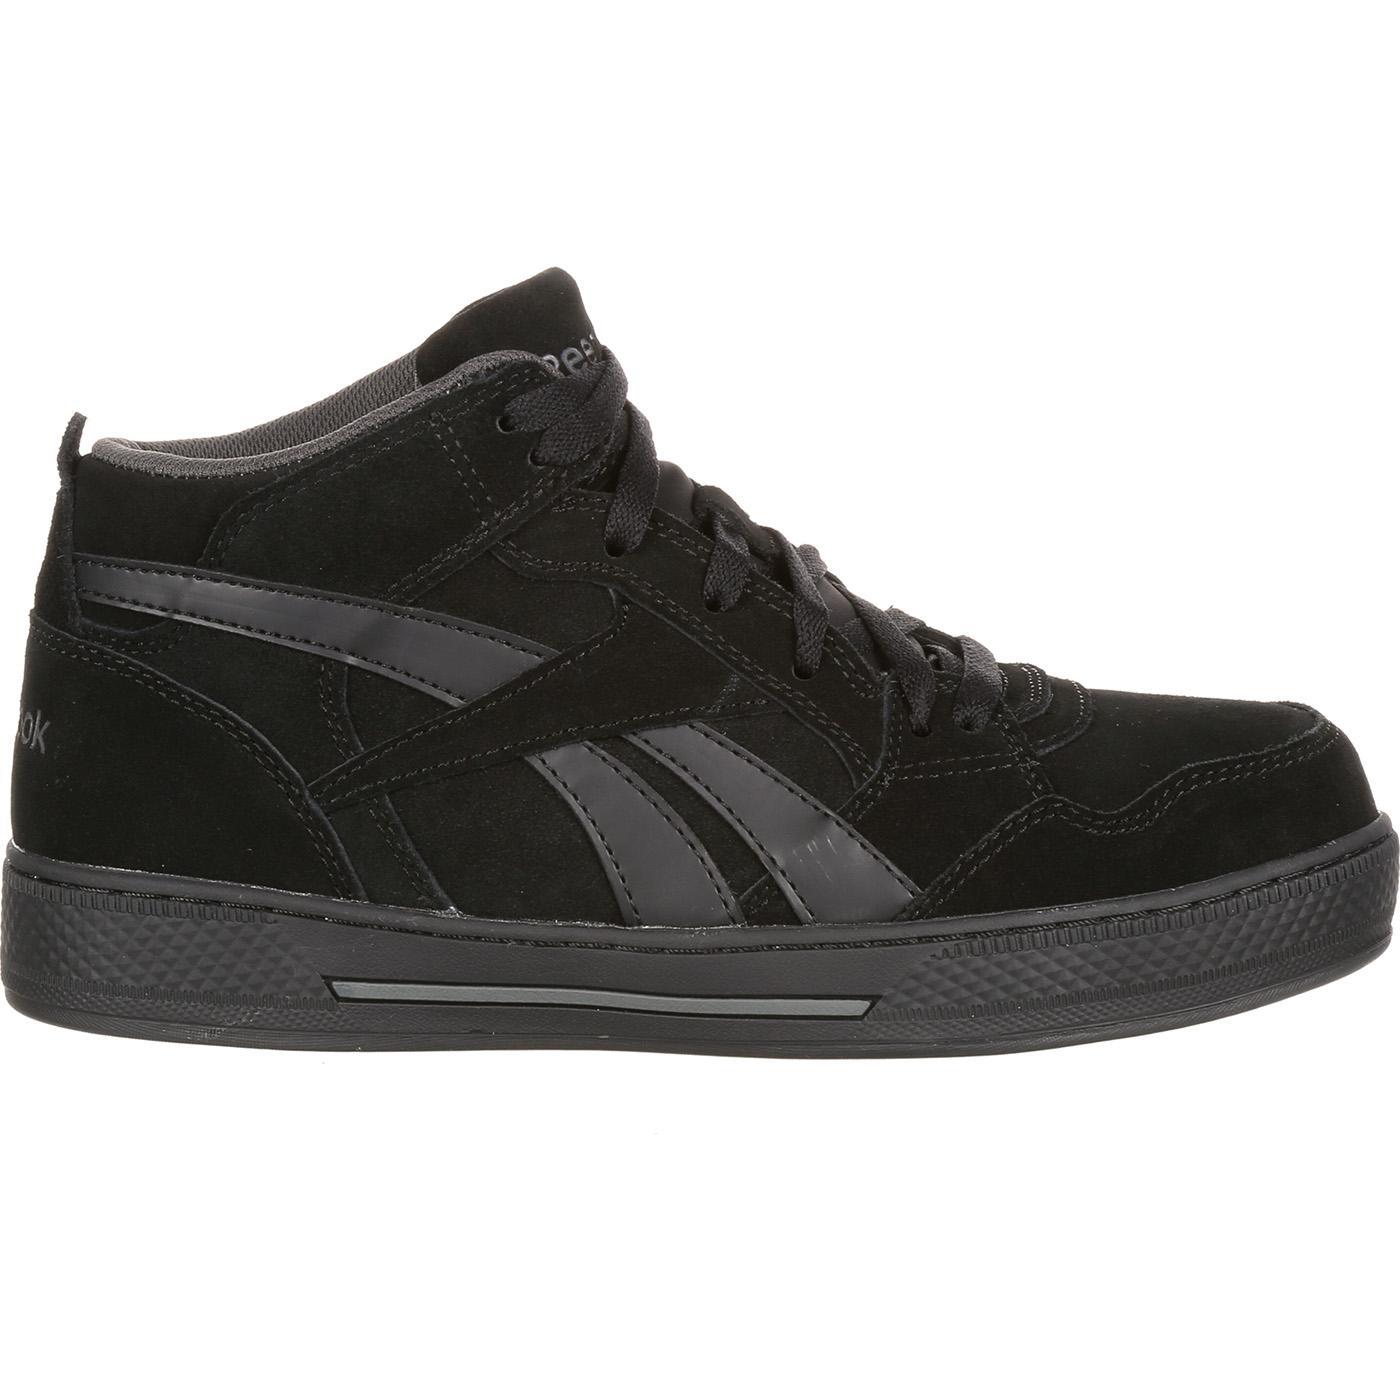 21980c601e6 Reebok Composite Toe MidHi Skate Work Shoe